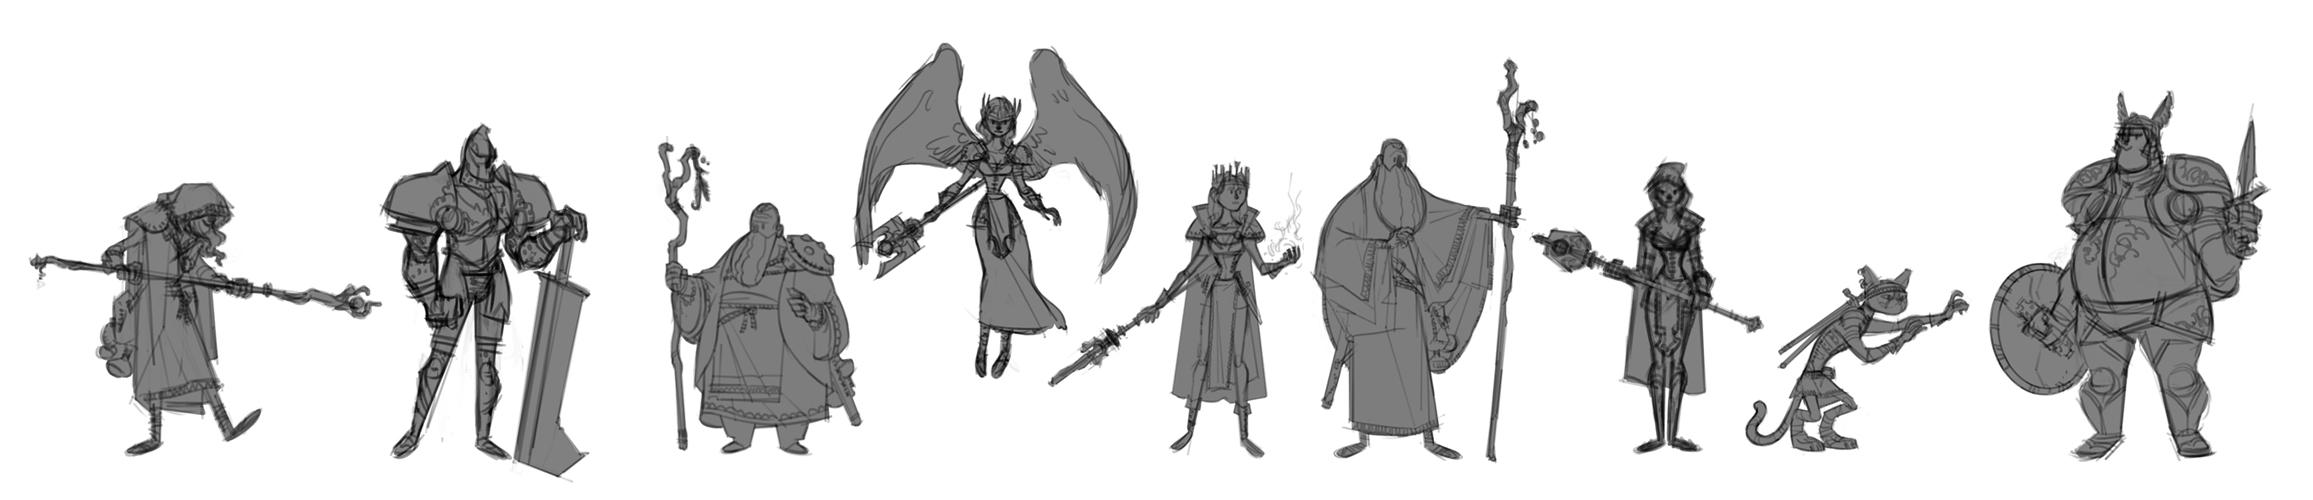 FantasyCharactersRough by stottt